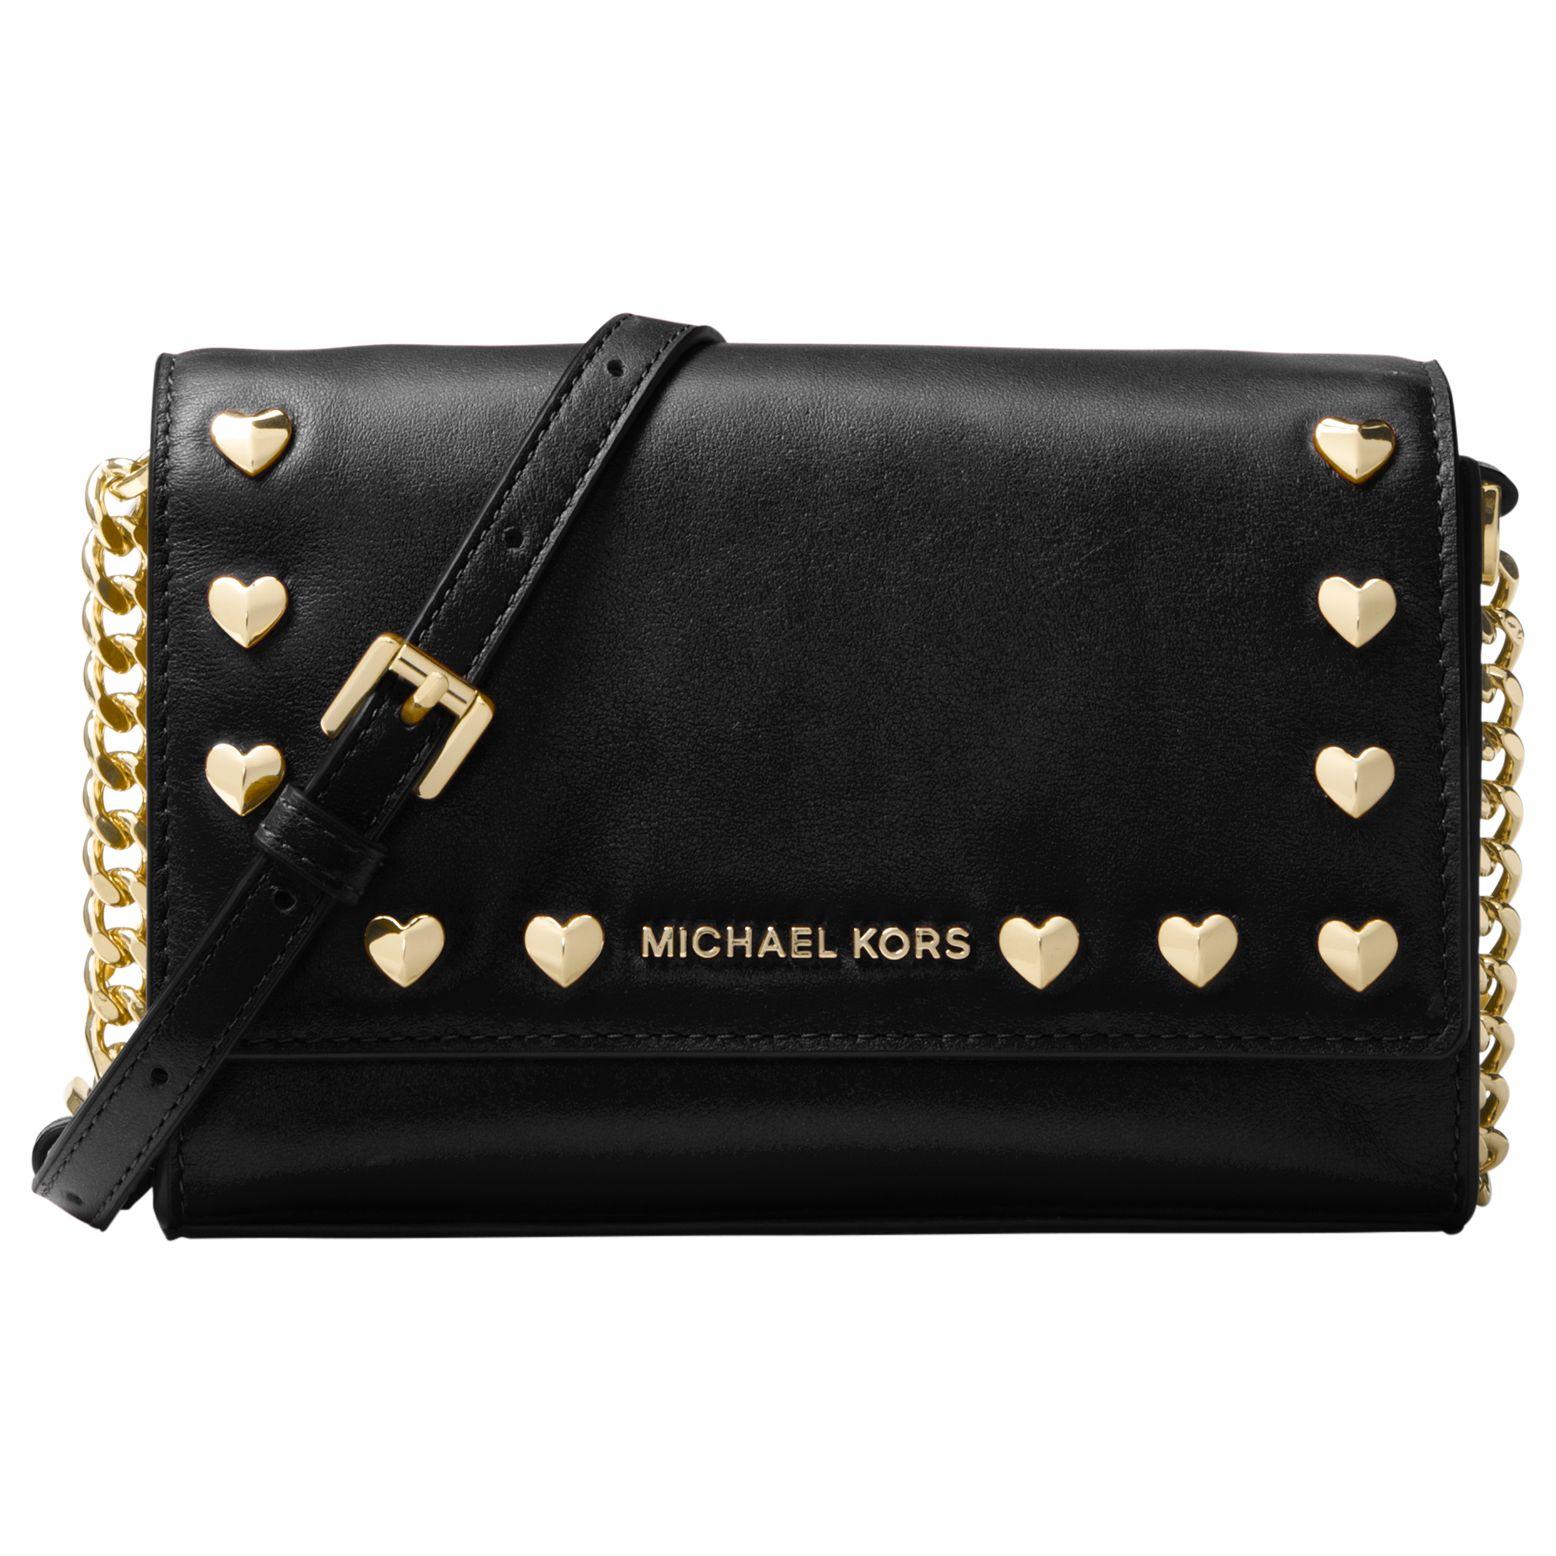 873d9b45d001 ... usa michael michael kors ruby leather heart stud clutch bag black at john  lewis partners c5fc9 ...